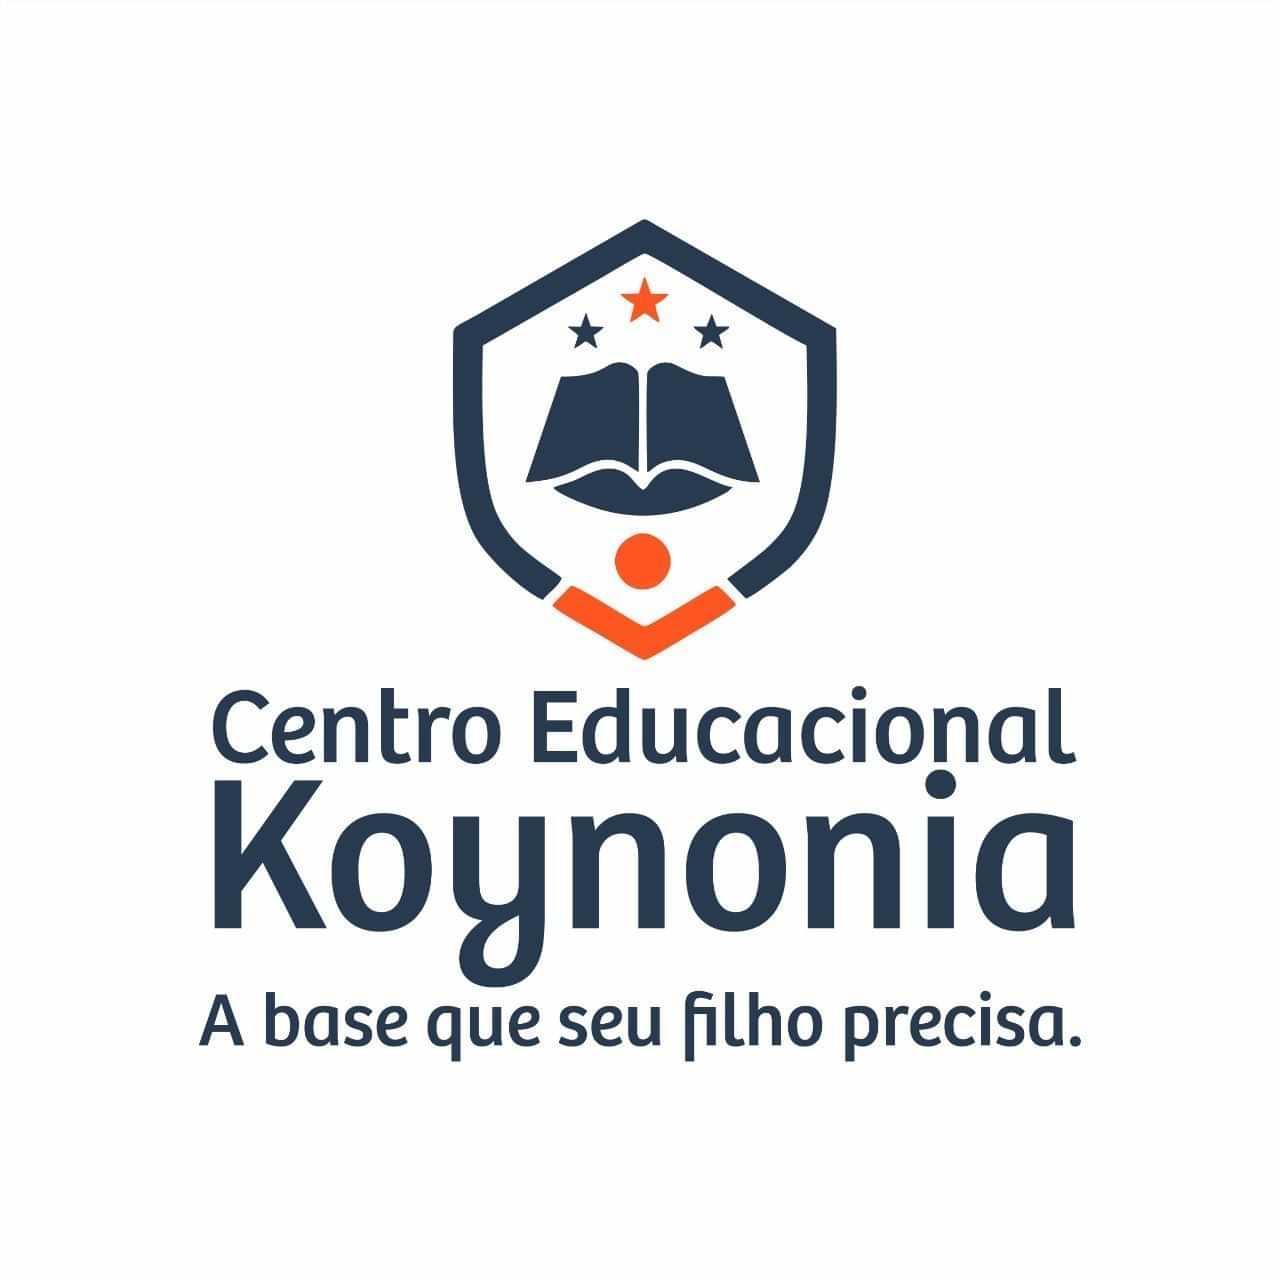 Centro Educacional Koynonia